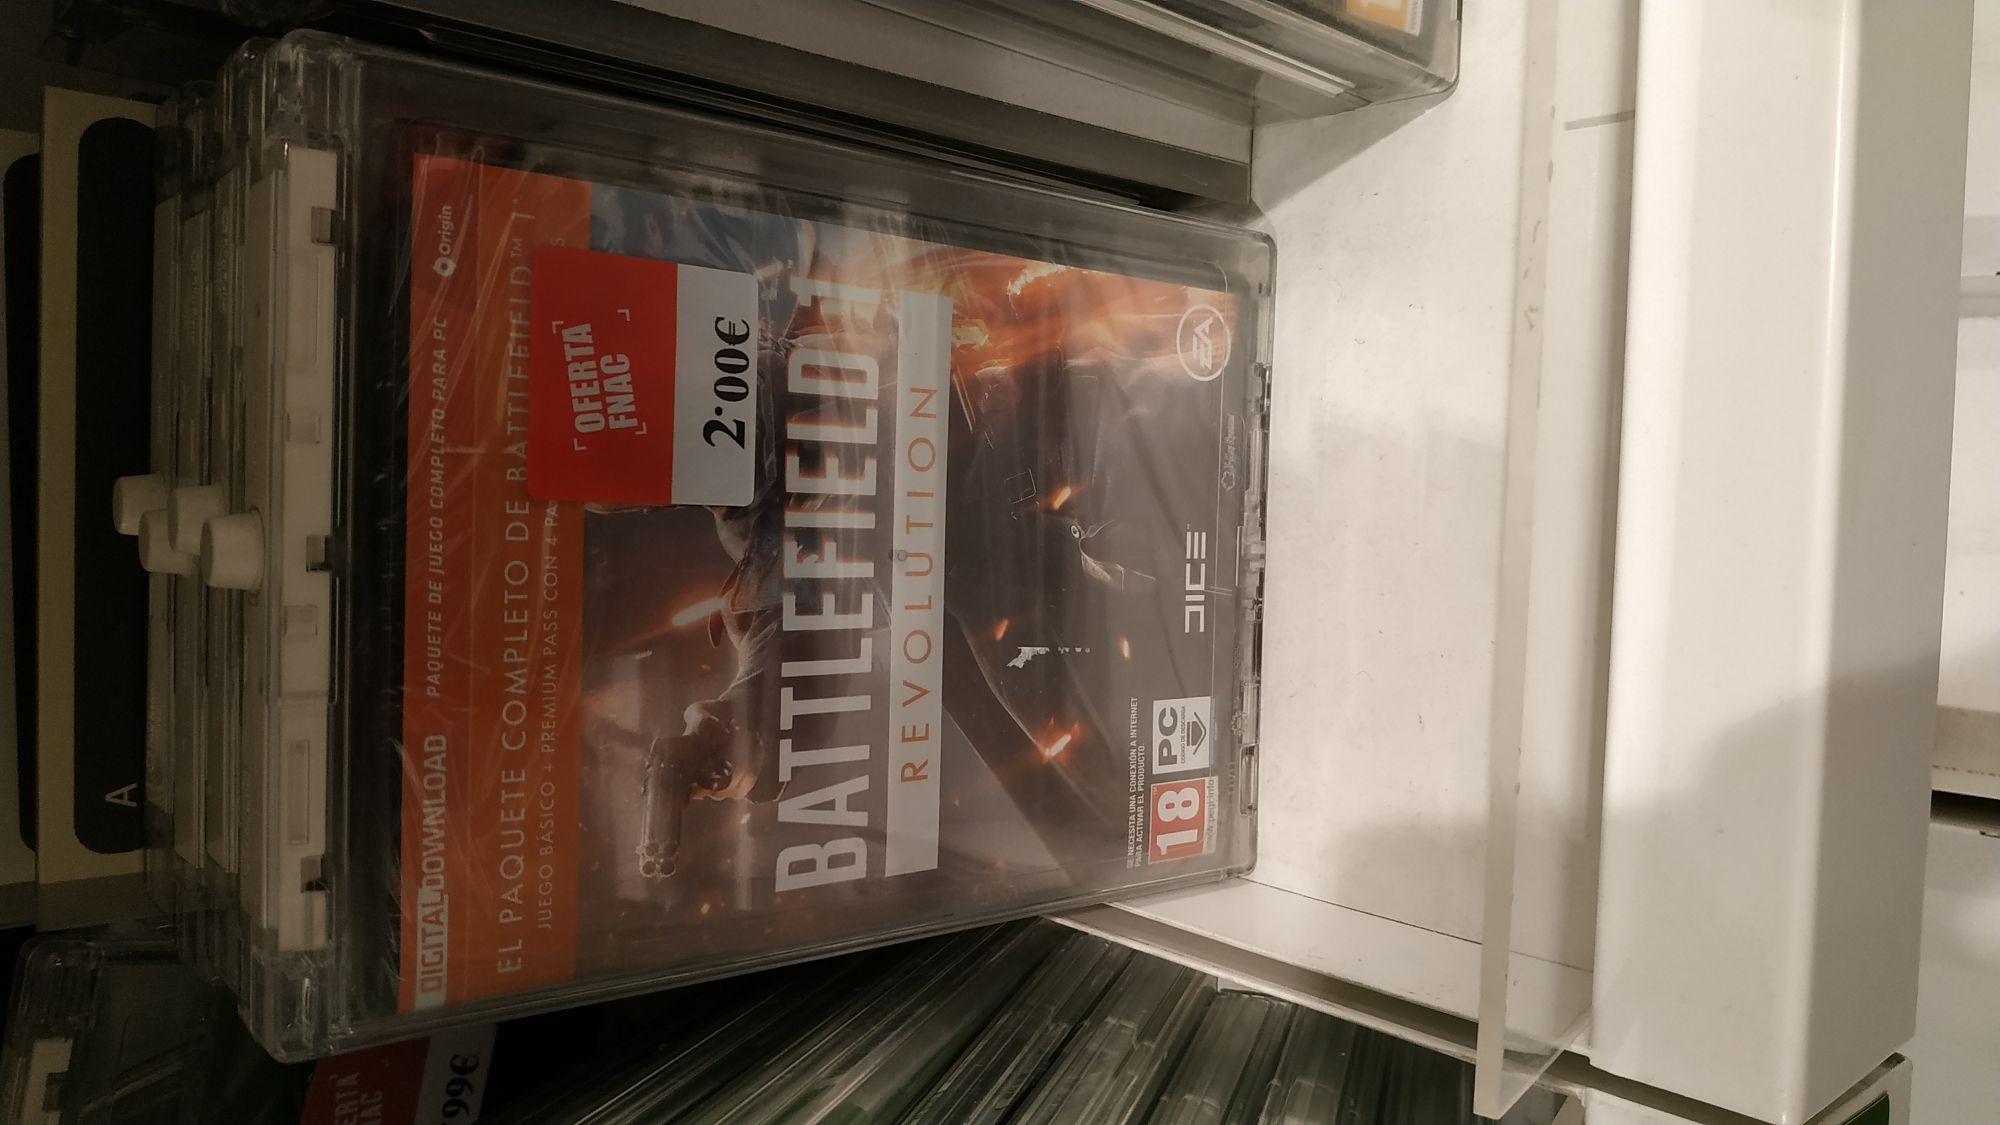 Battlefield 1 Revolution por 2 euros en FNAC La Maquinista